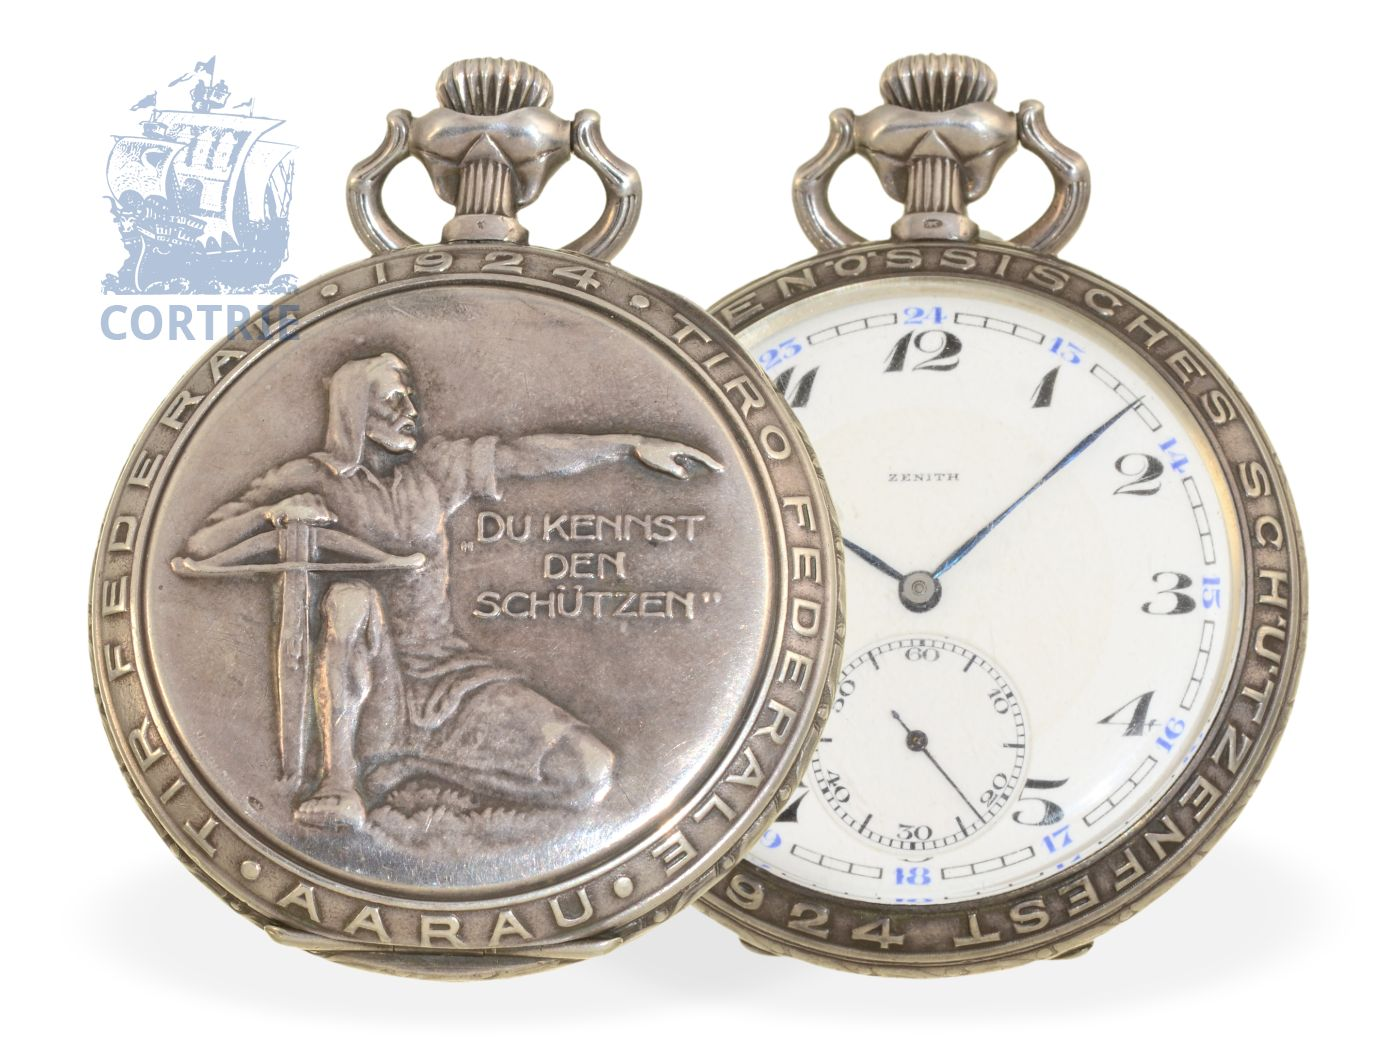 Pocket watch: very rare marksmen watch Tir Federal Aarau 1924, precision watch by Zenith-